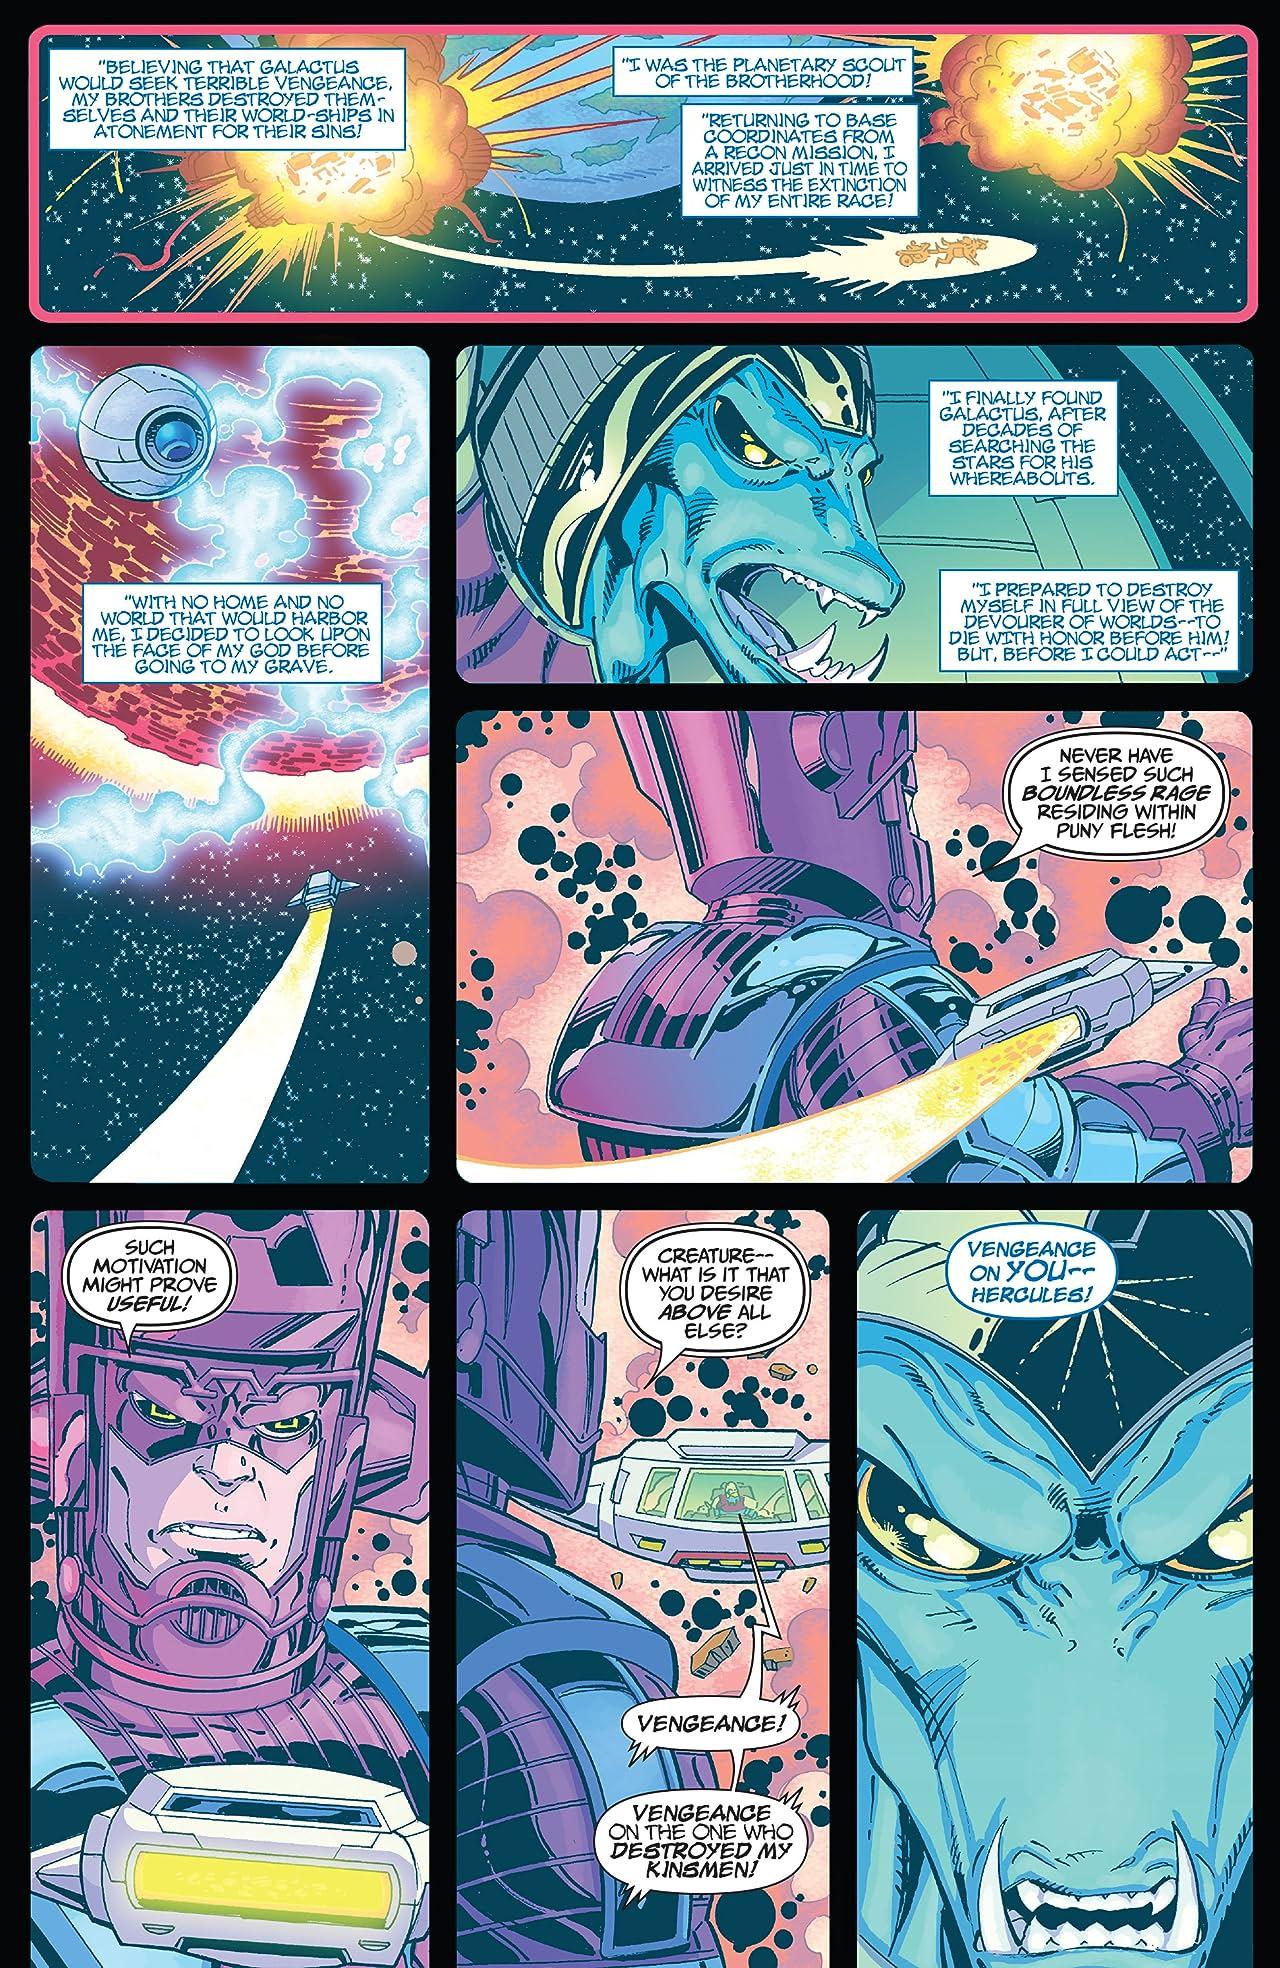 Hercules: Twilight of a God (2010) #2 (of 4)